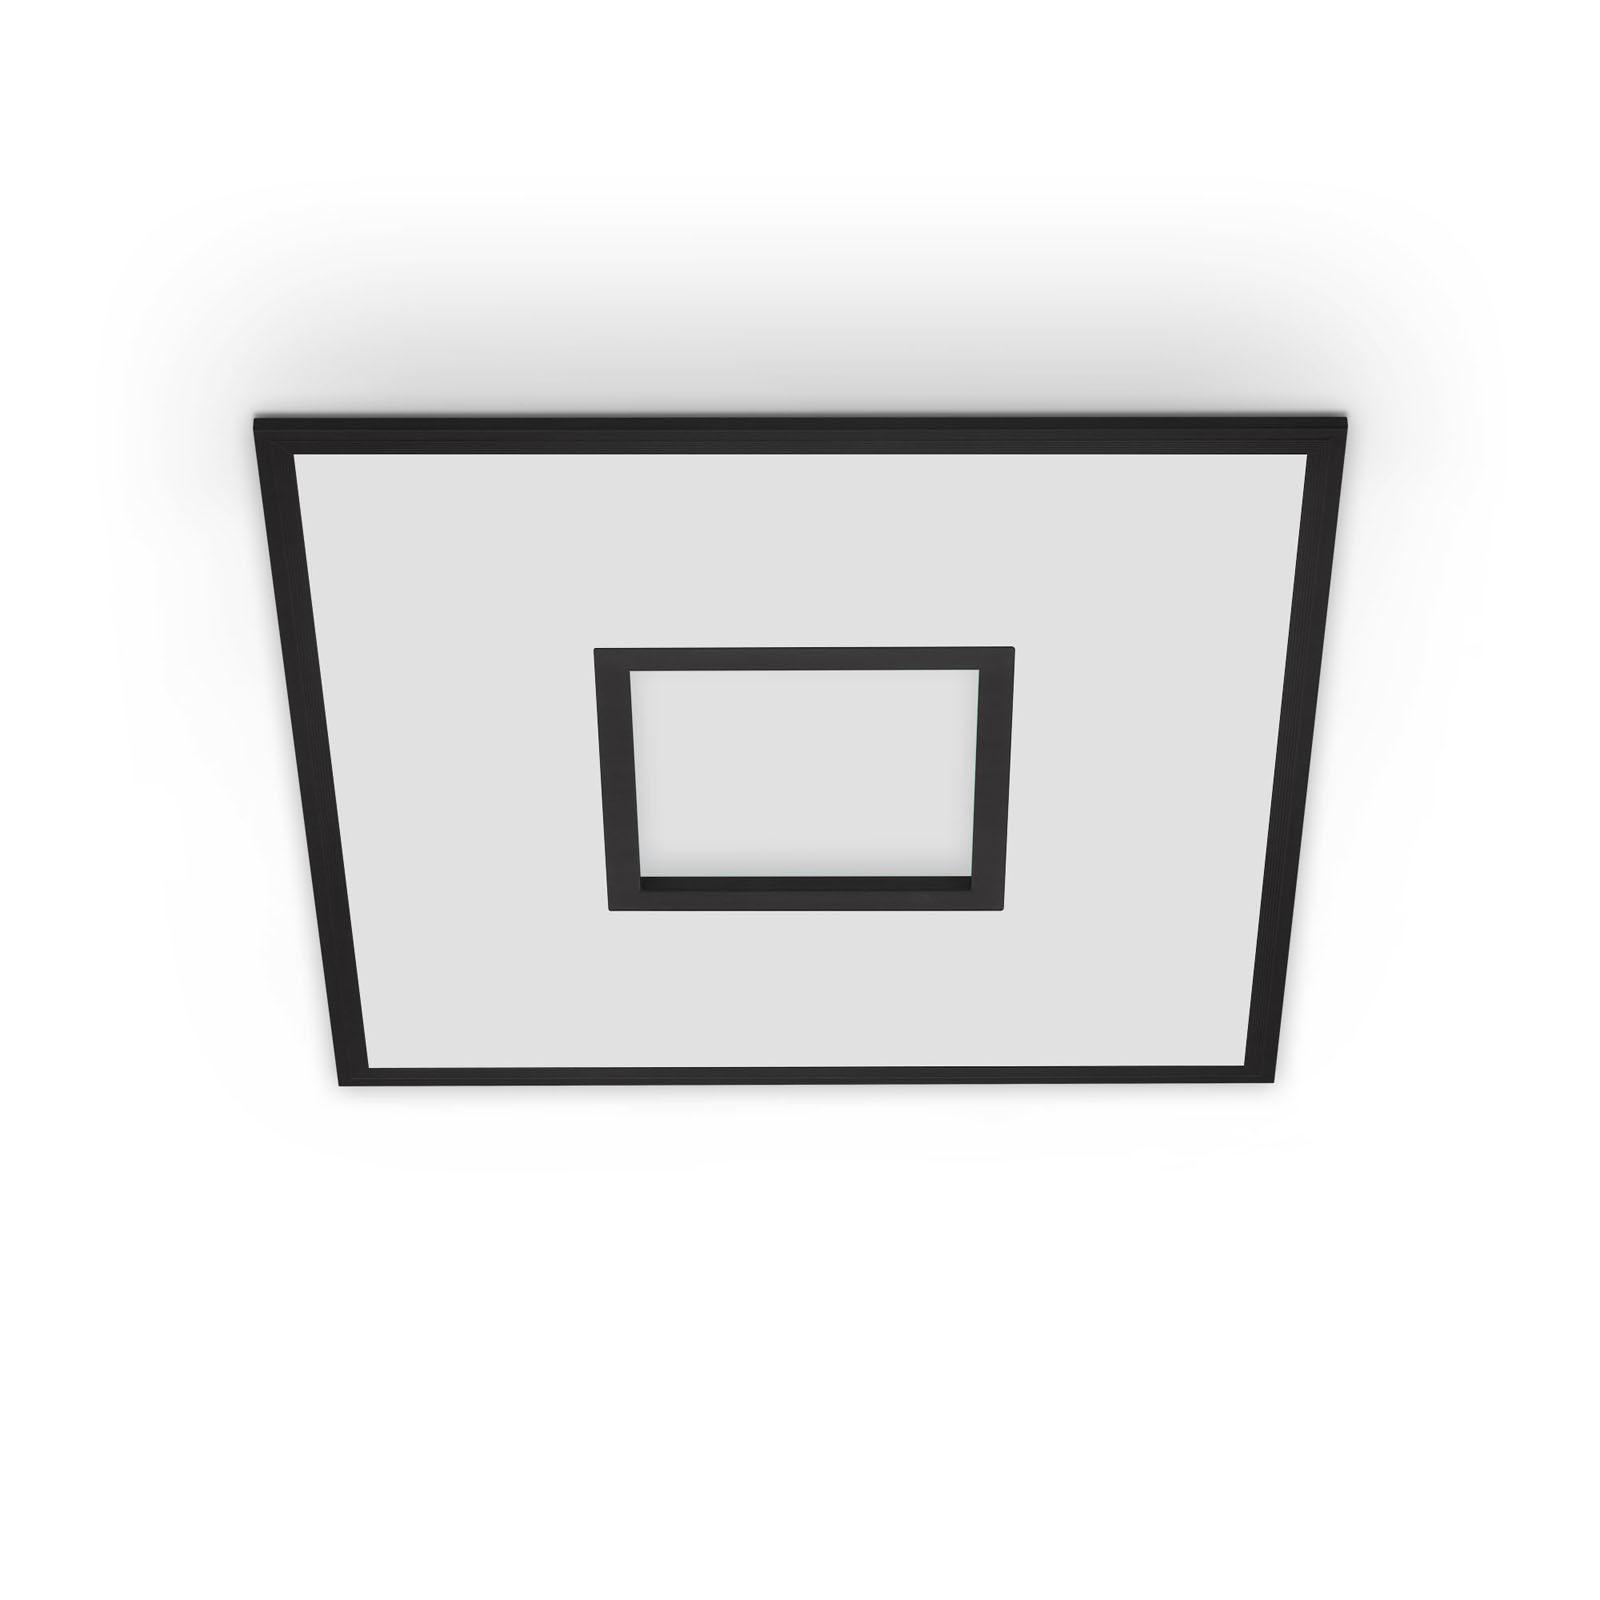 TELEFUNKEN CCT LED Panel, 59,5 cm, 36 W, Schwarz